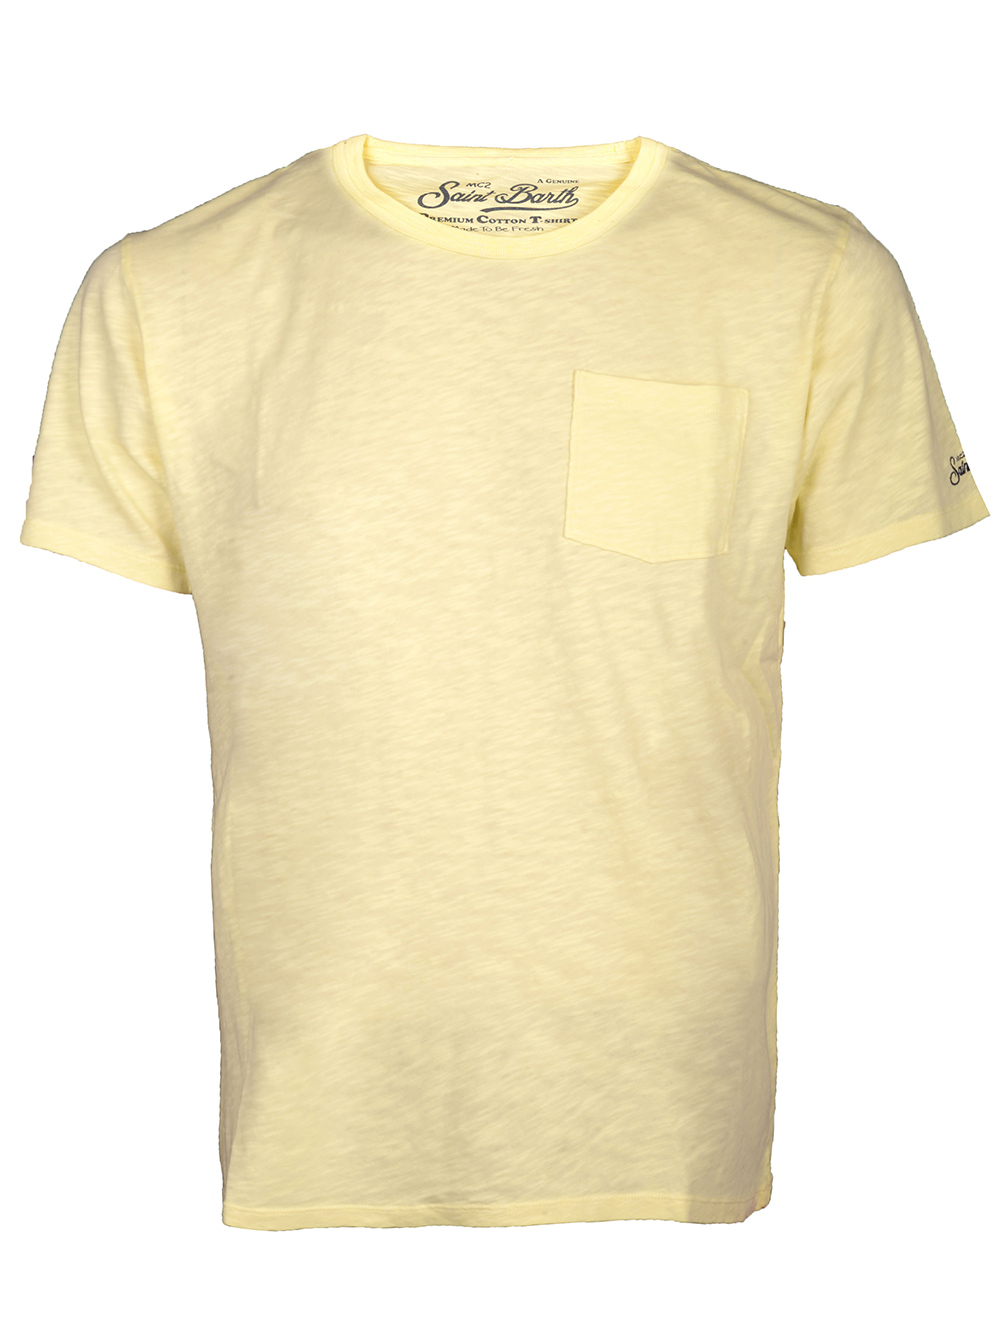 Mc2 St.BarthSALT WATER Μπλούζα t-shirt PRE0001 ΚΙΤΡΙΝΟ